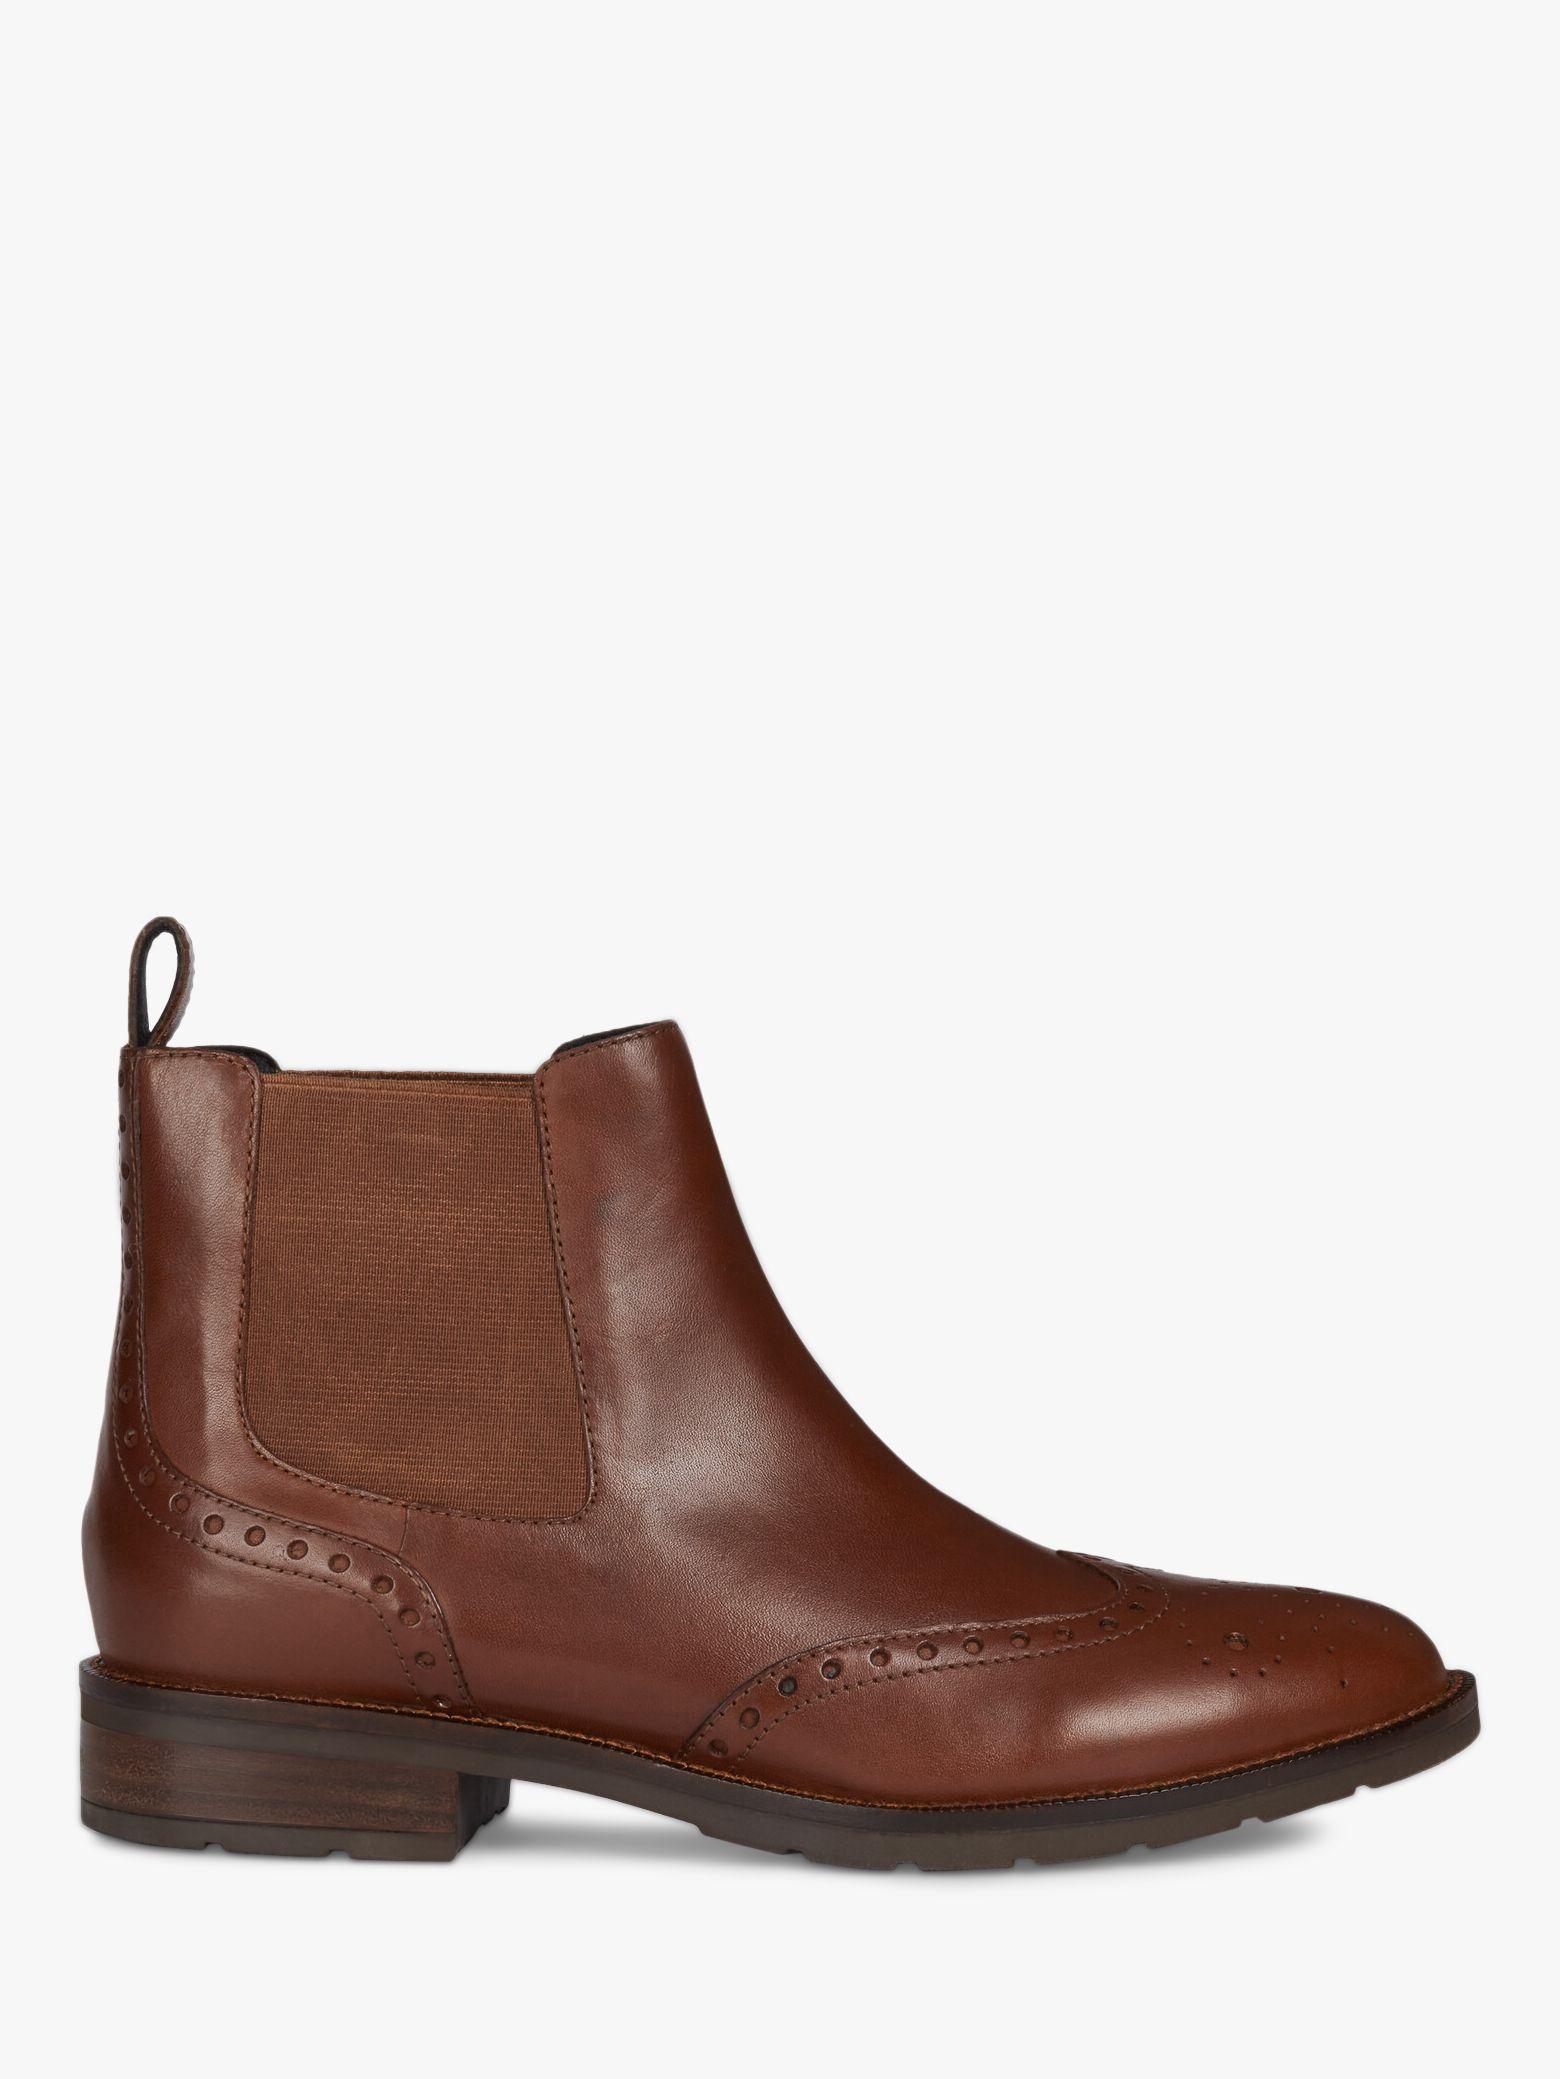 Geox Geox Women's Bettanie Leather Chelsea Ankle Boots